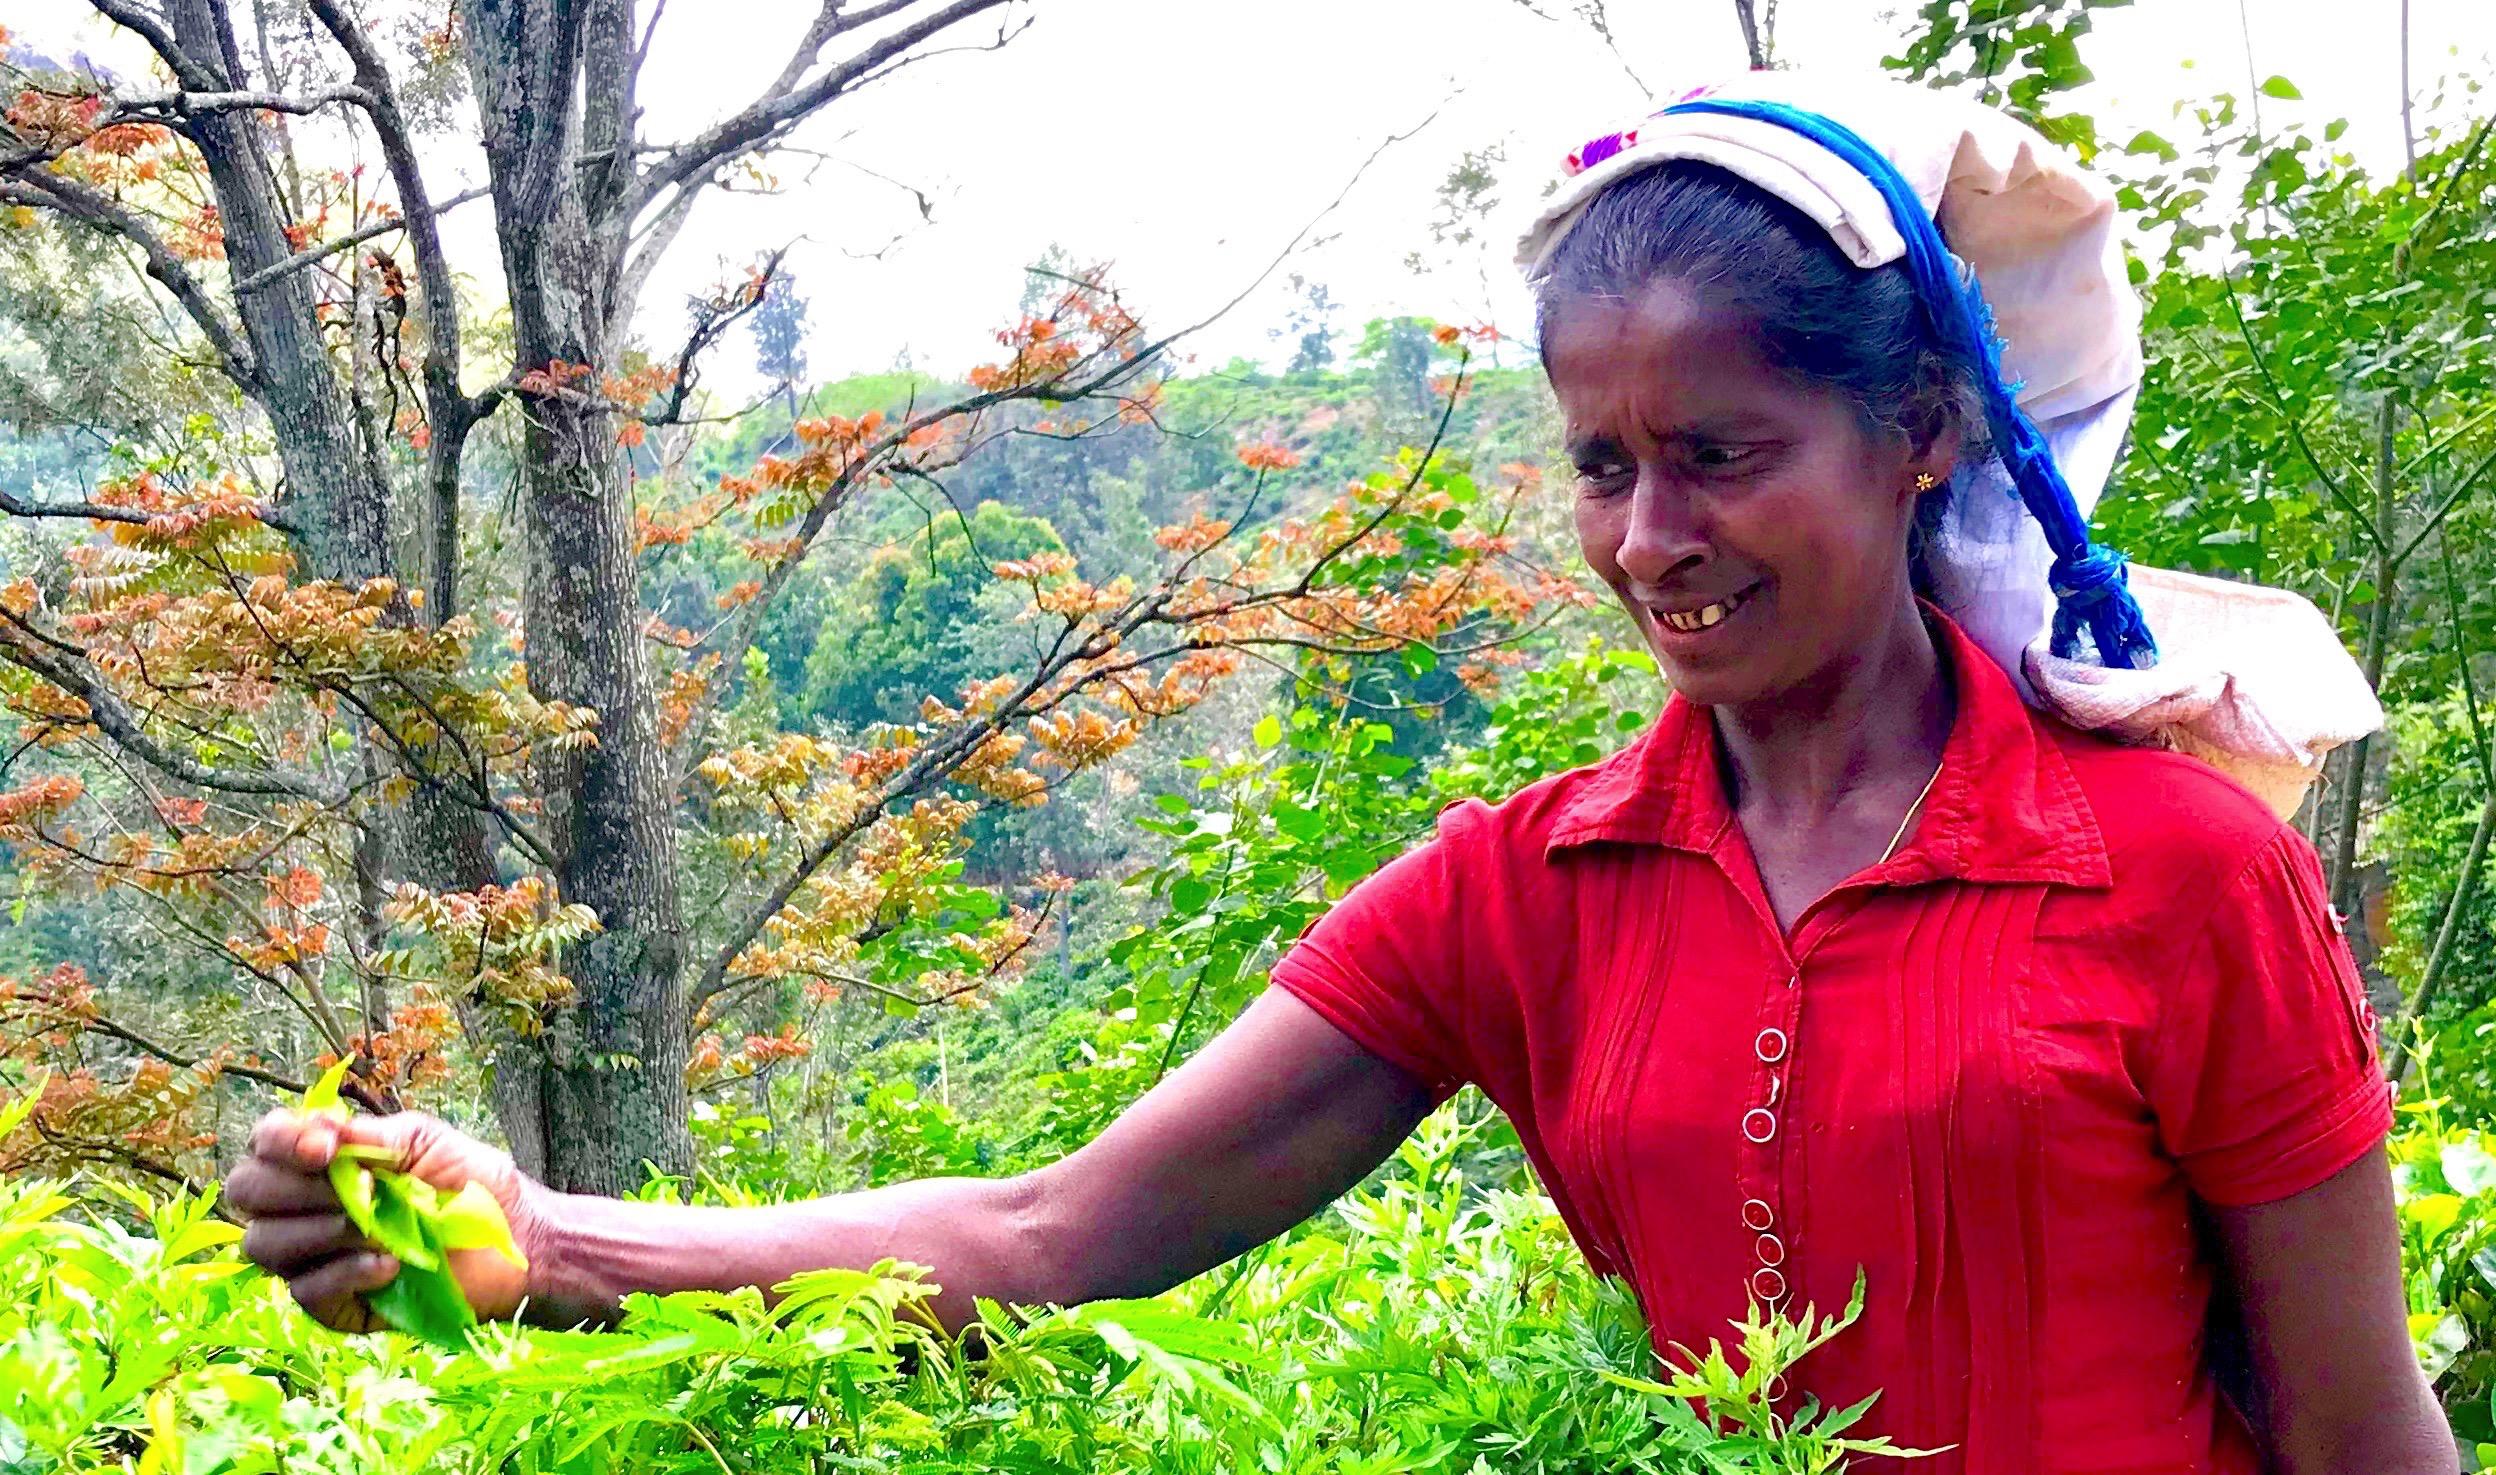 Tea picker at 48 Acres near Ella in Sri Lanka © London Intelligence ®